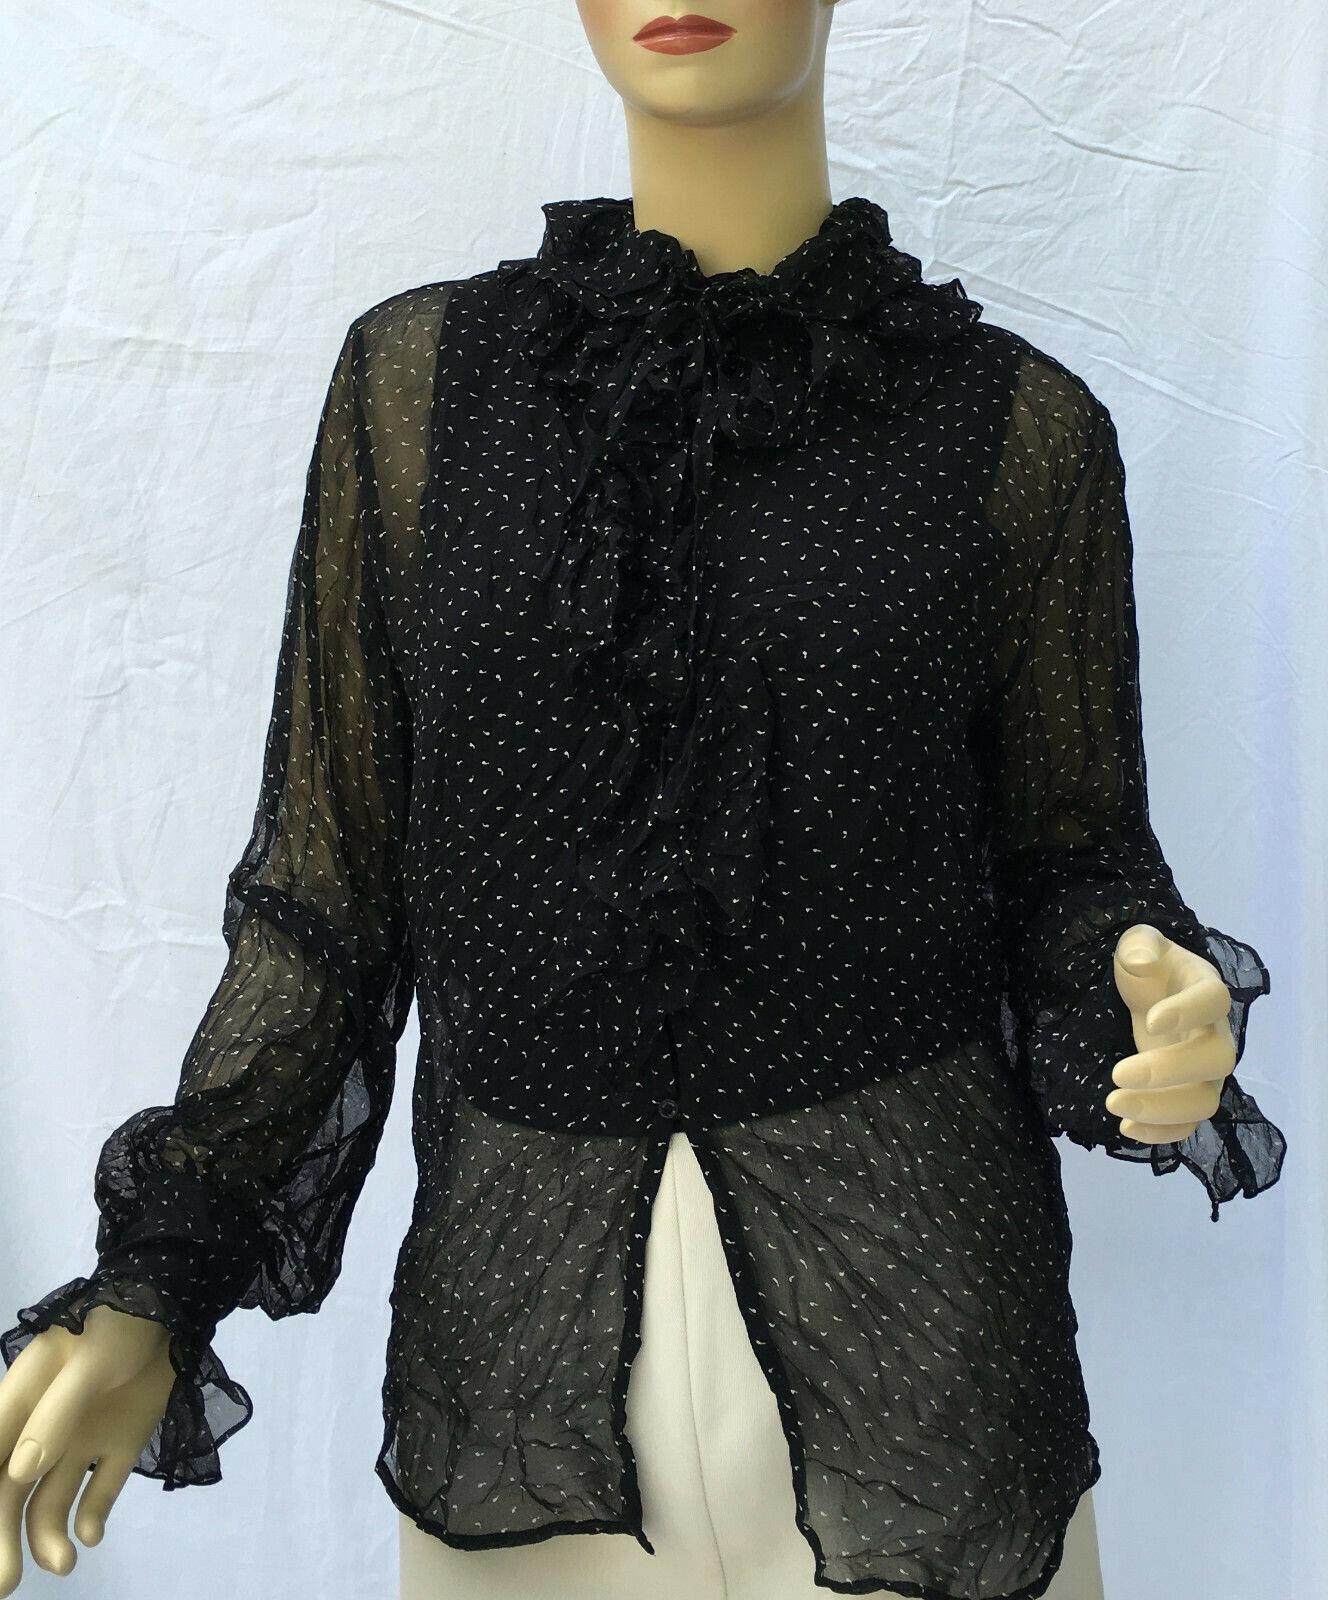 Ralph Lauren Blau Label Ruffle Silk damen Shirt 6 schwarz Sheer LS